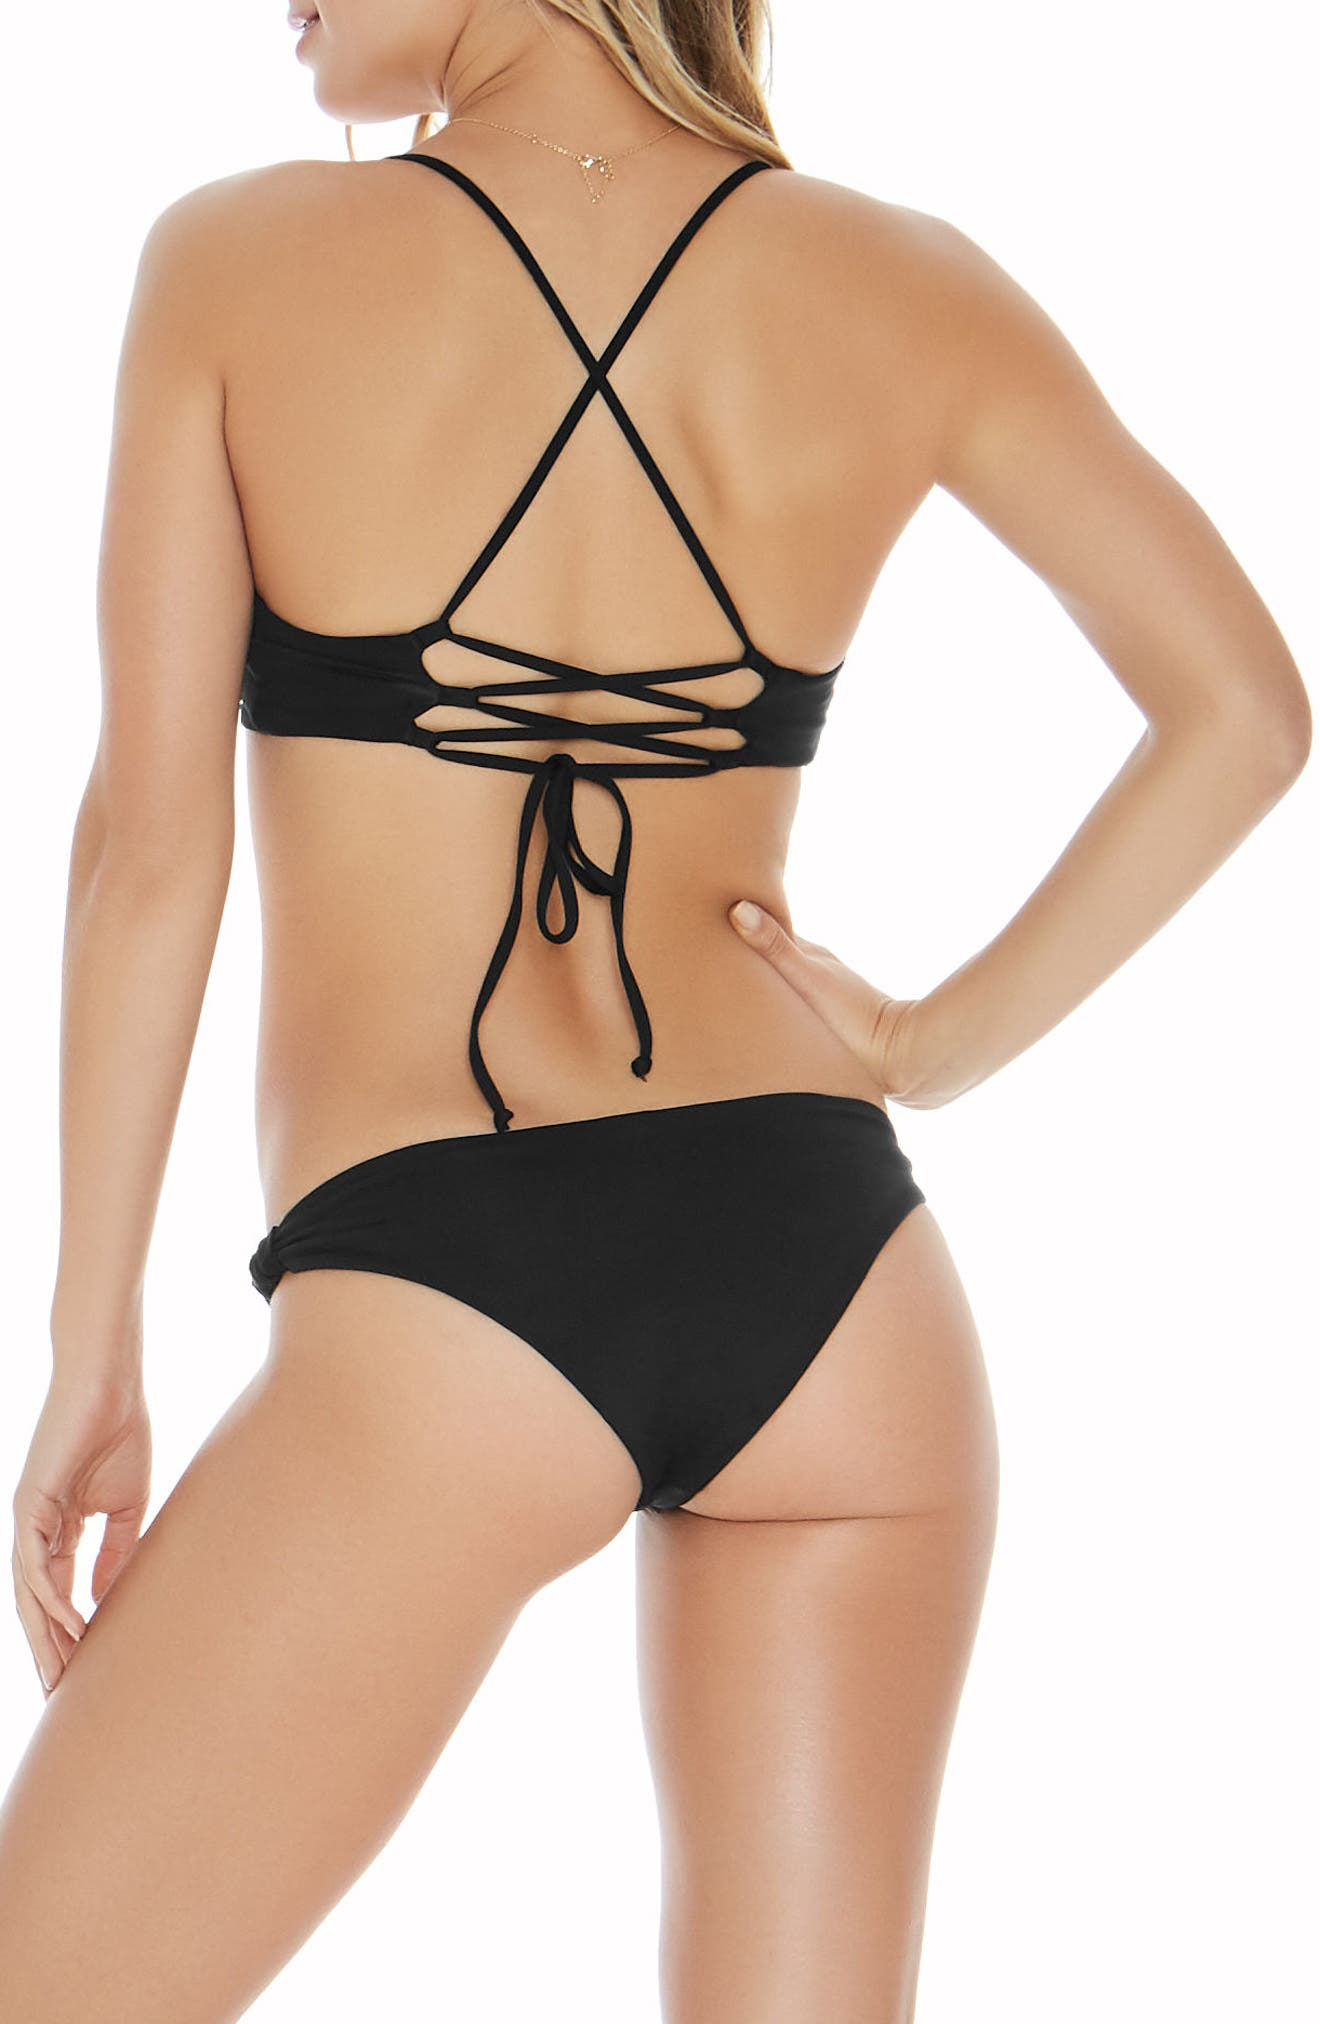 Flynn Domino Bikini Top,                             Alternate thumbnail 2, color,                             Black